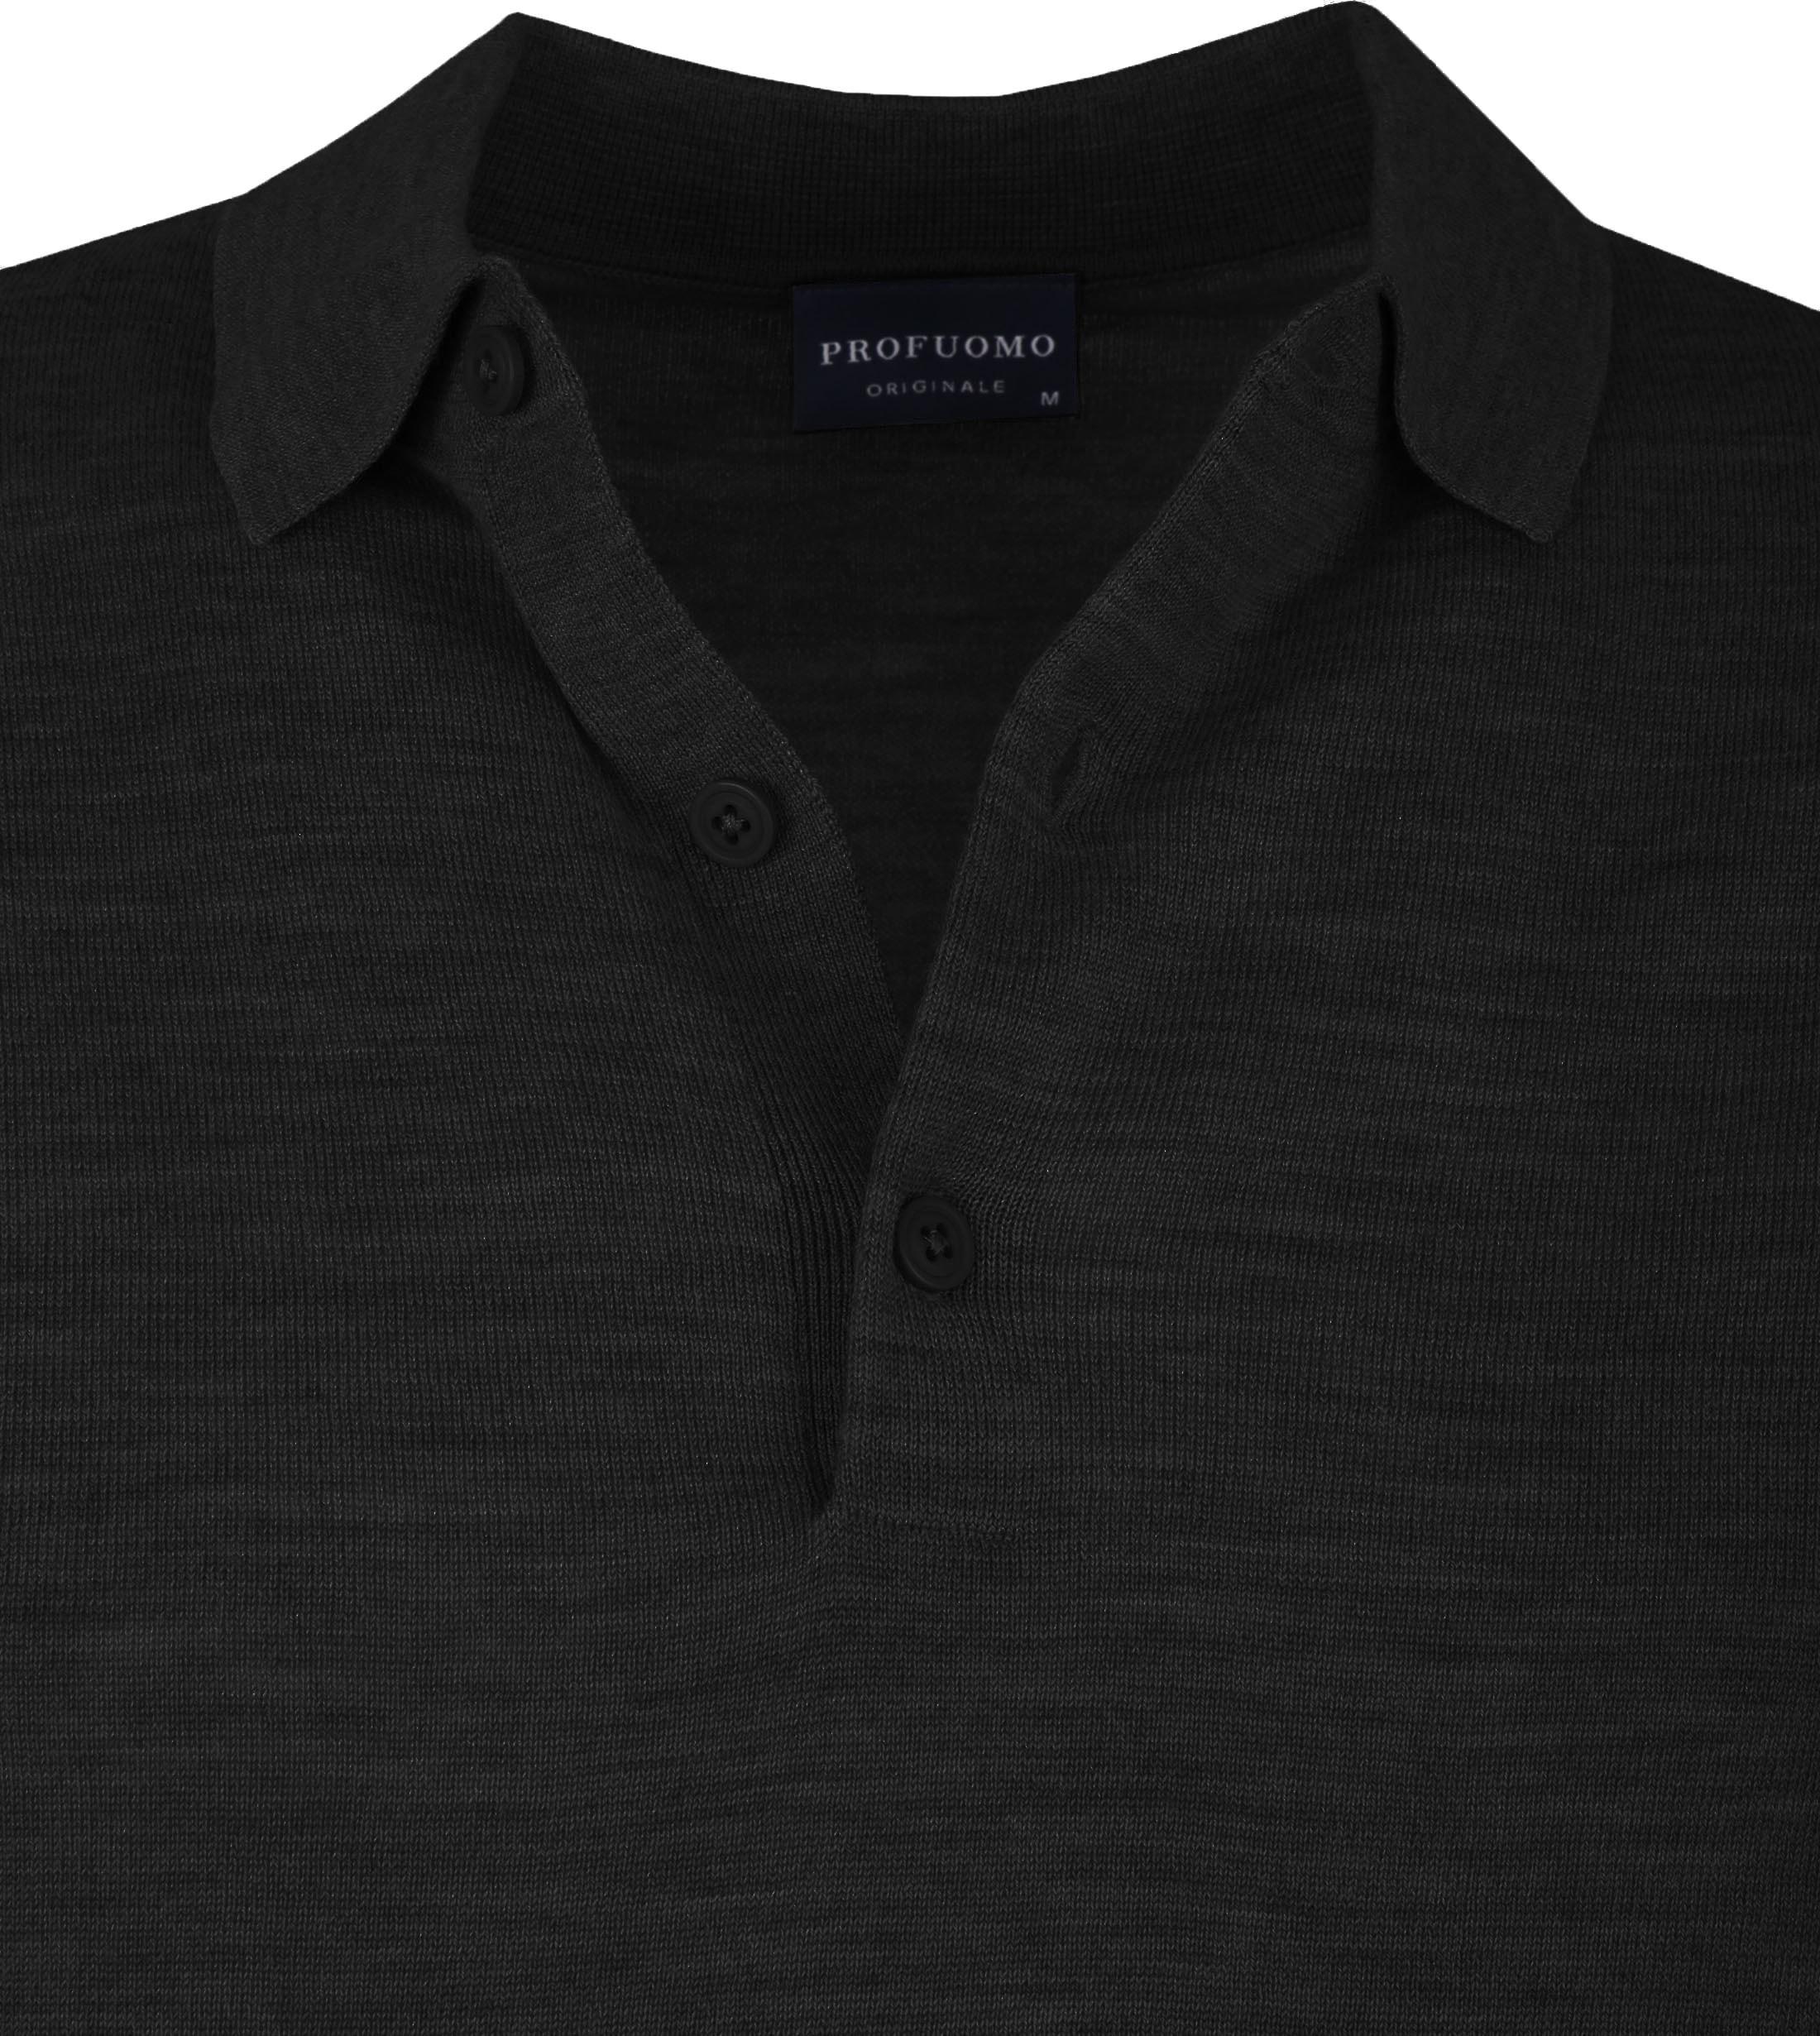 Profuomo Merino Poloshirt Black foto 1